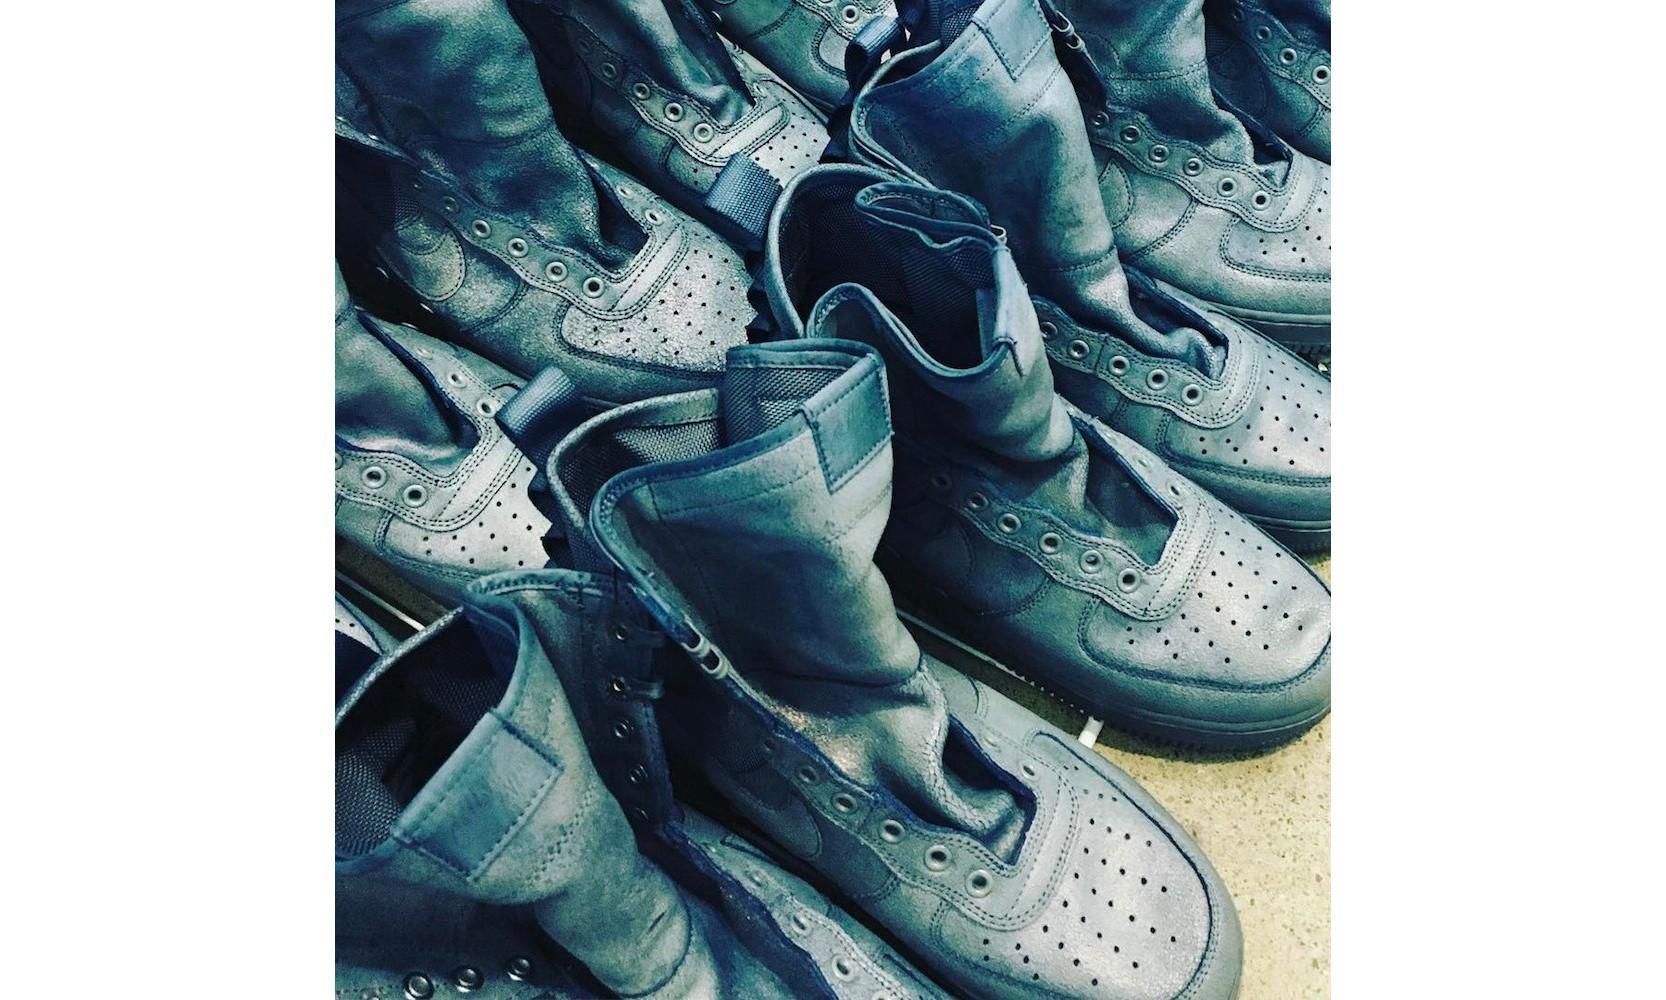 全明星周末福利,Don C 将免费赠予鞋迷蓝染 Nike SF-AF1